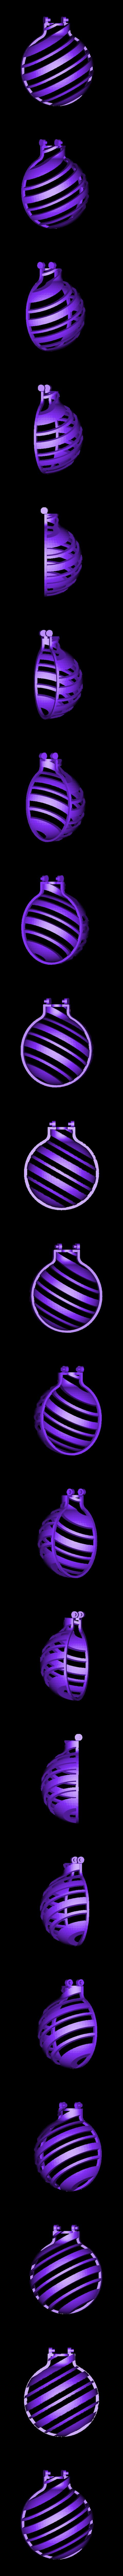 Cage_Half_2.STL Download free STL file Decorative Ornament Cage • 3D printable object, Porda